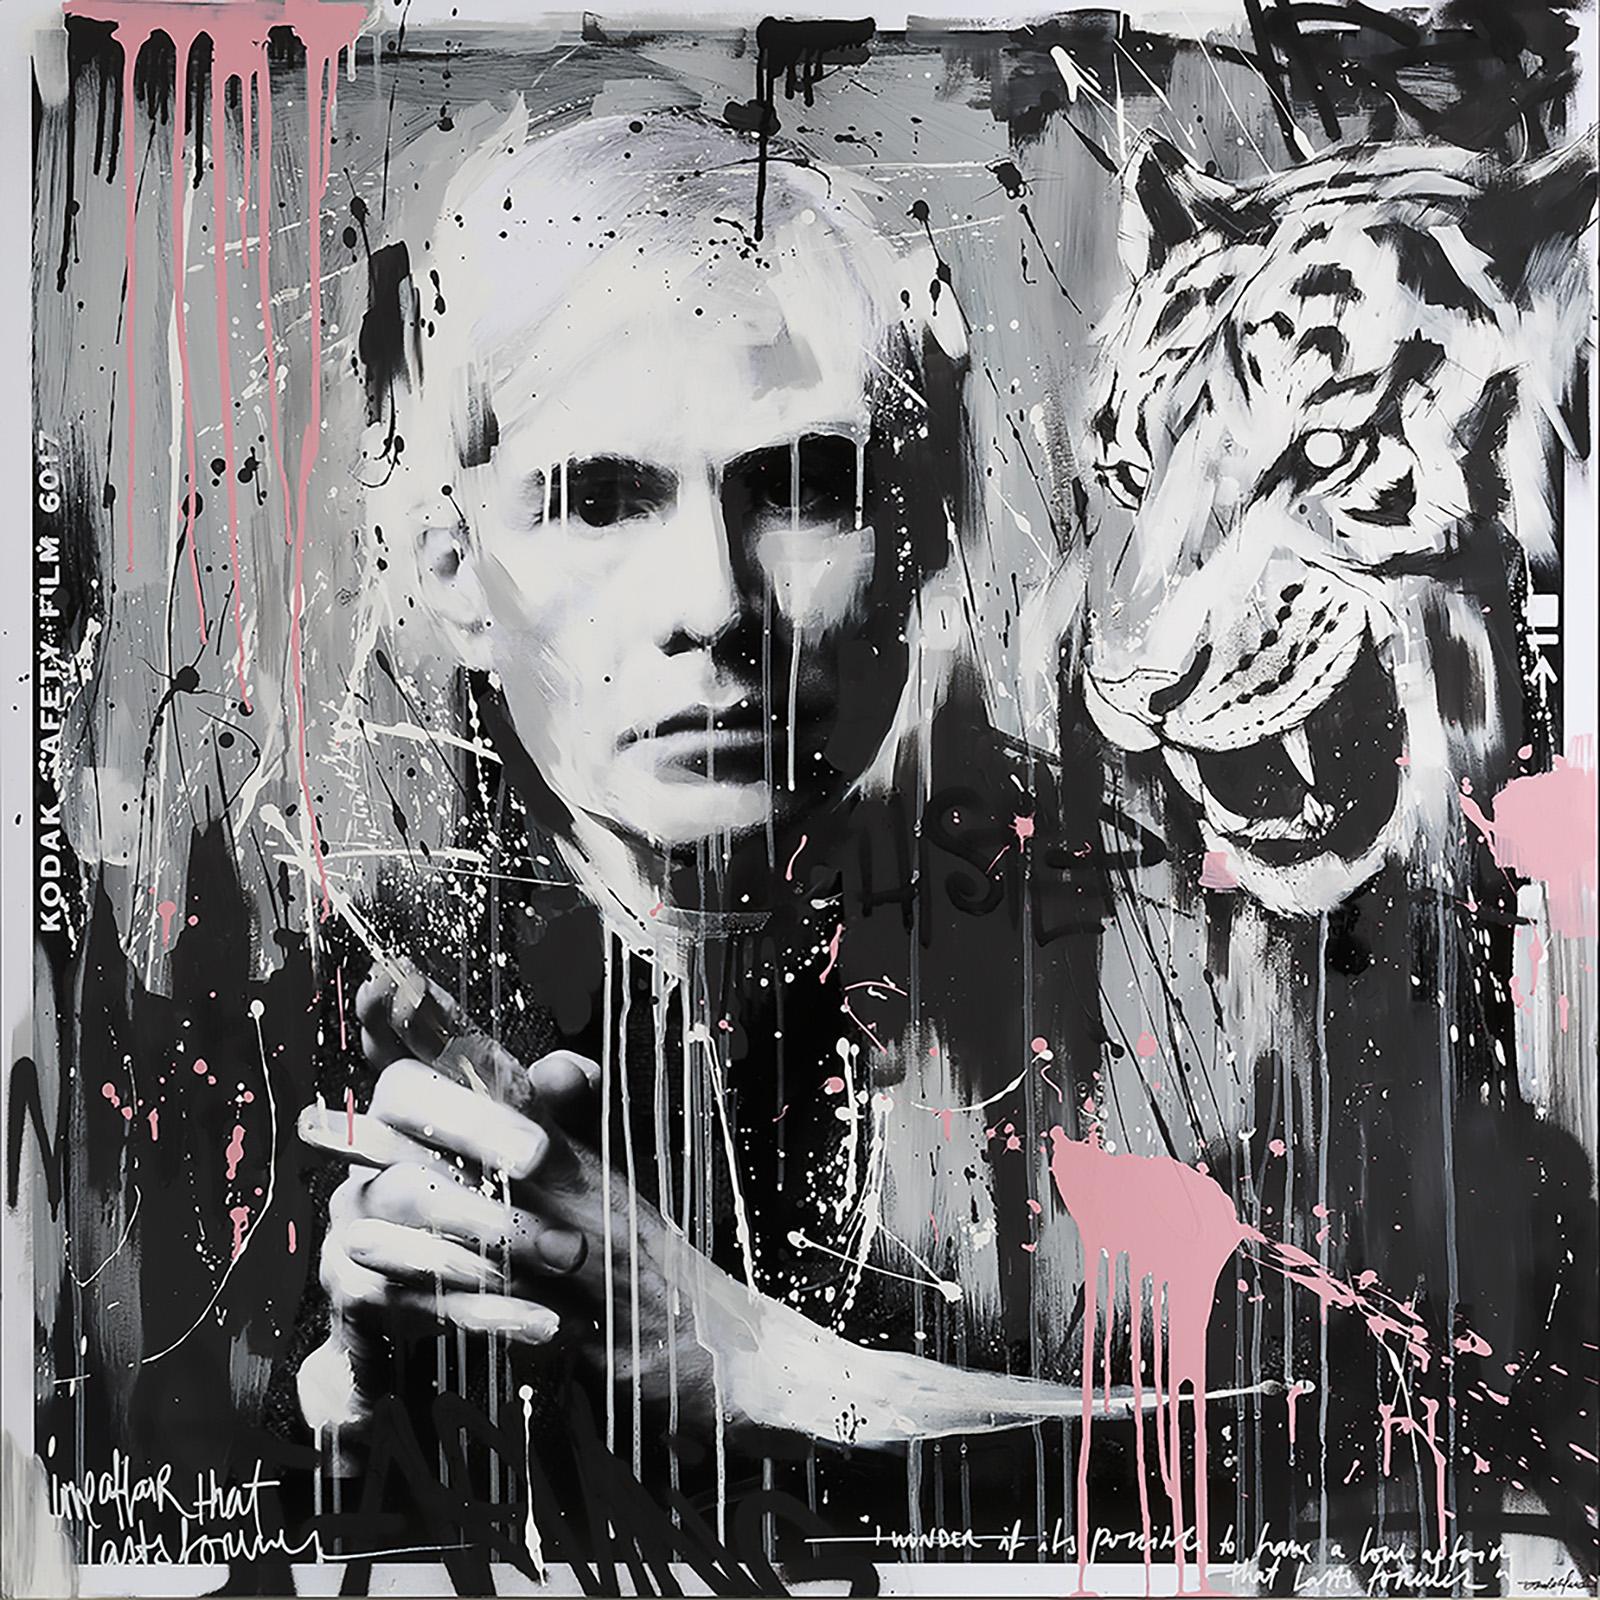 Tiger Warhol  mixed media 27 x 27 collaboration: Karen Bystedt x Tamara Alves